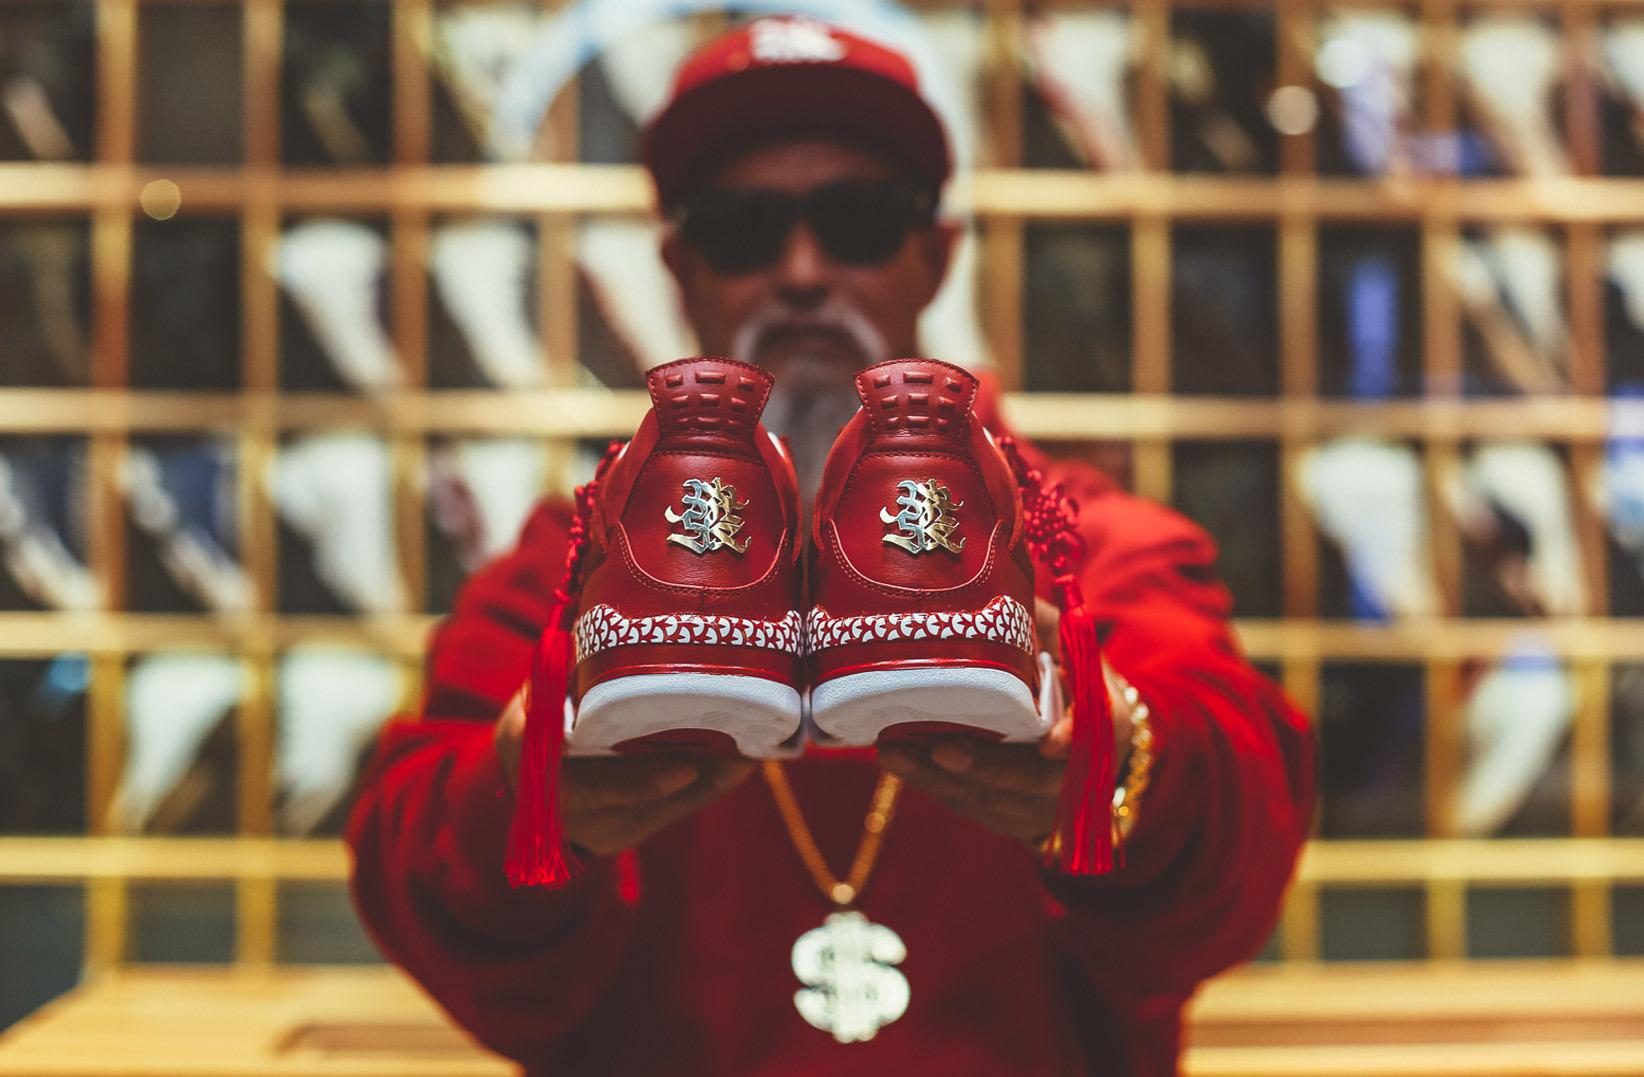 Nike mừng Tết cổ truyền với Air Jordan 4 'CNY' Custom